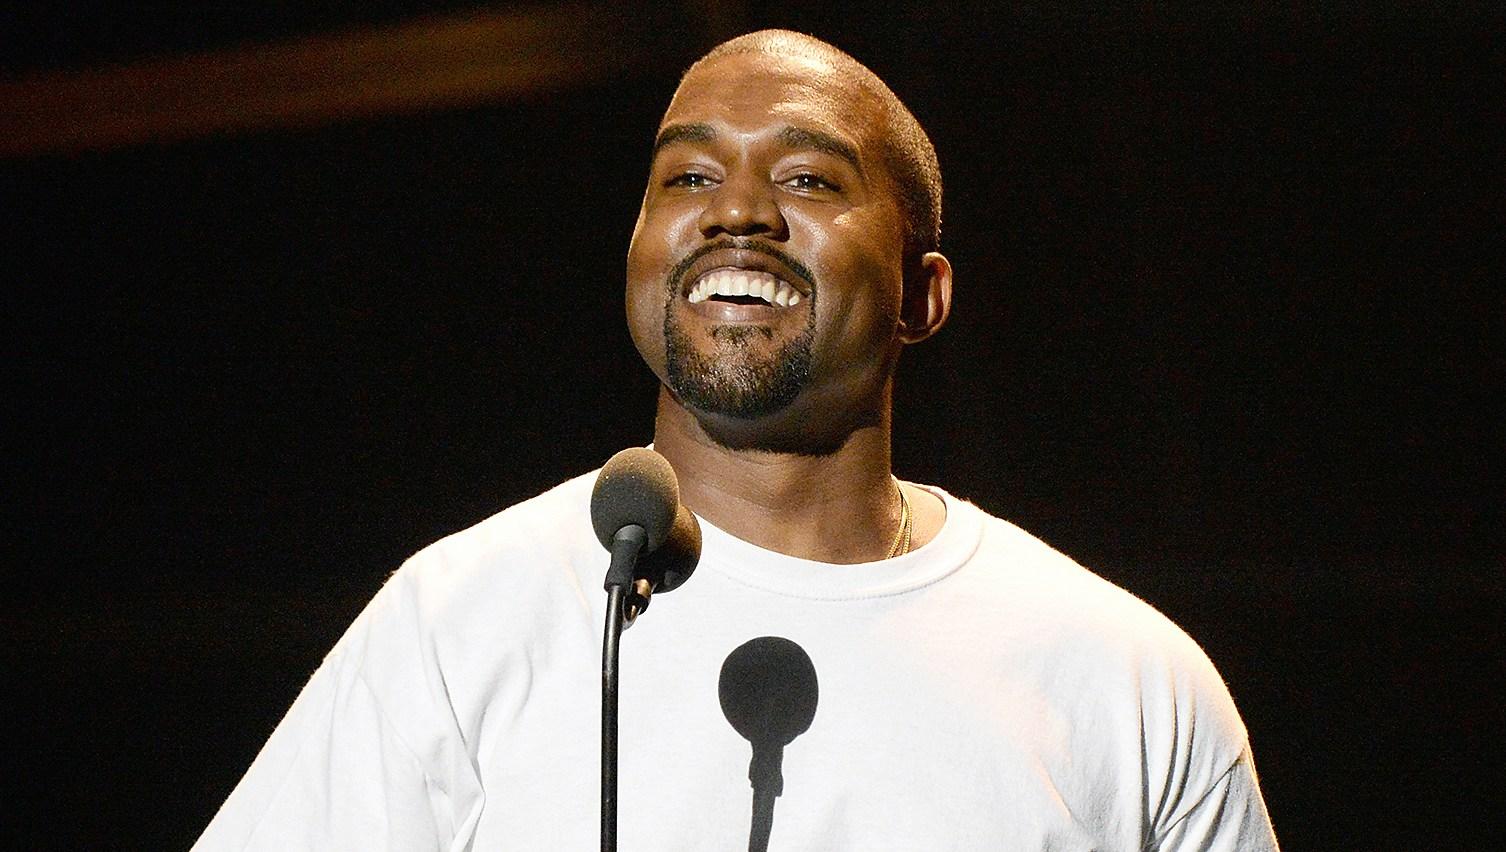 Kanye West Bizarre Twitter Rant Writing Book